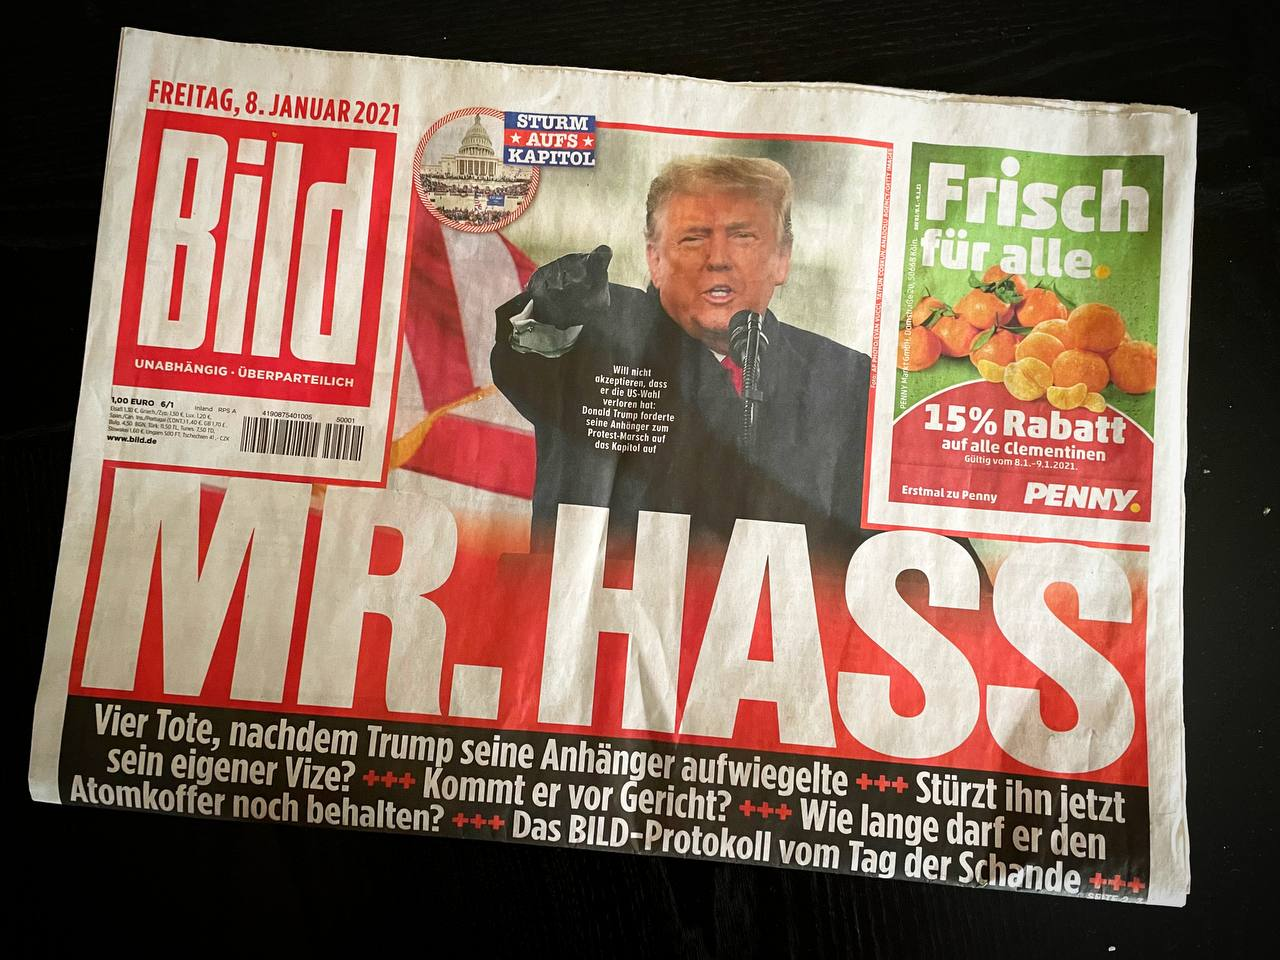 BILD kürt Mr. Hass 2021